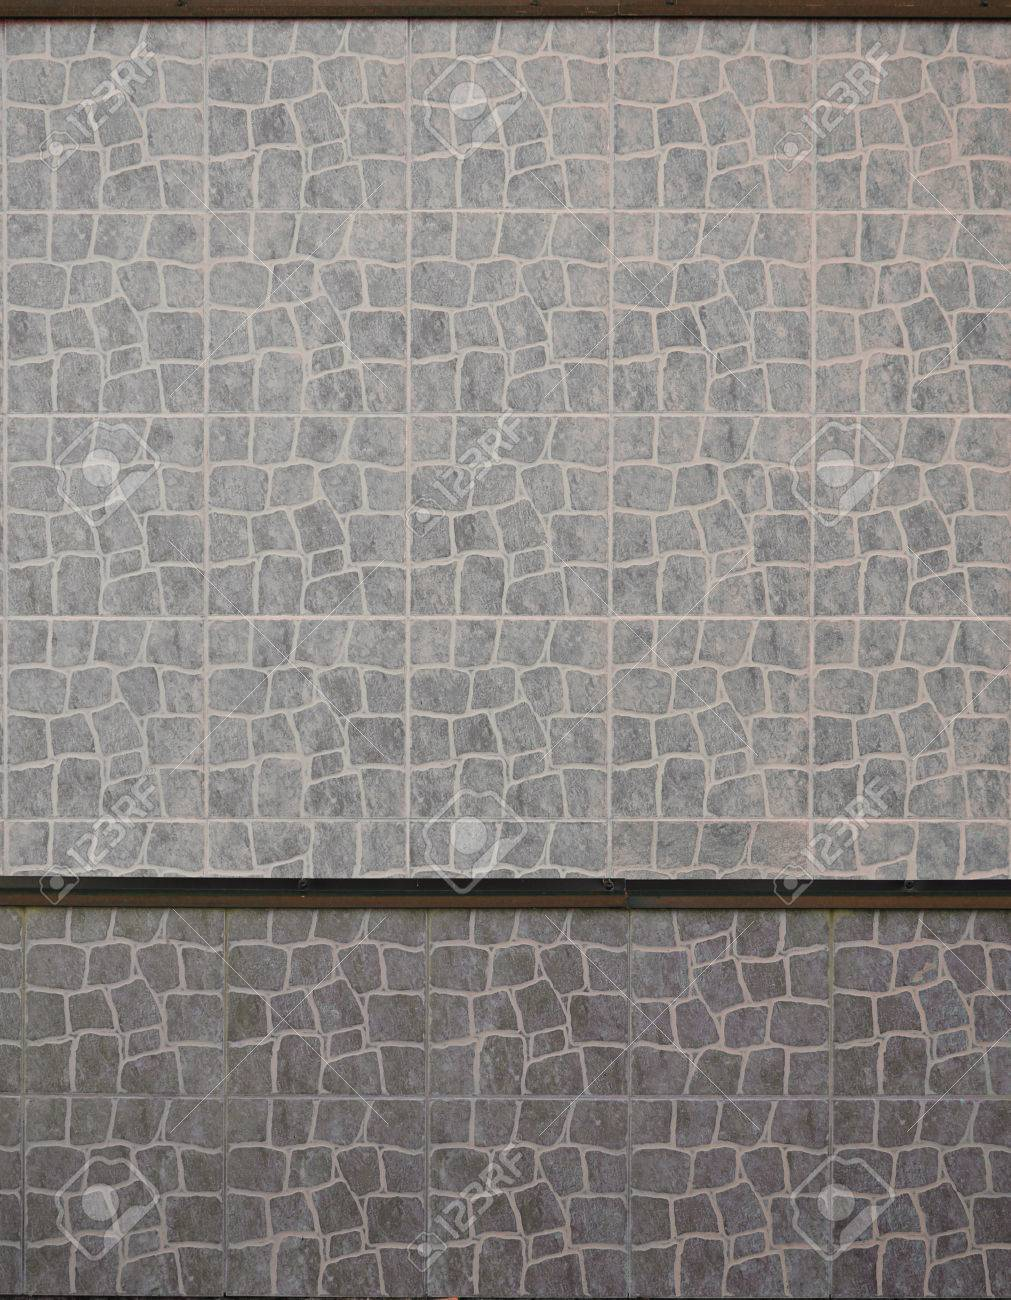 Russische Keramik Wandfliesen Textur Moderne Aussen Marmorboden